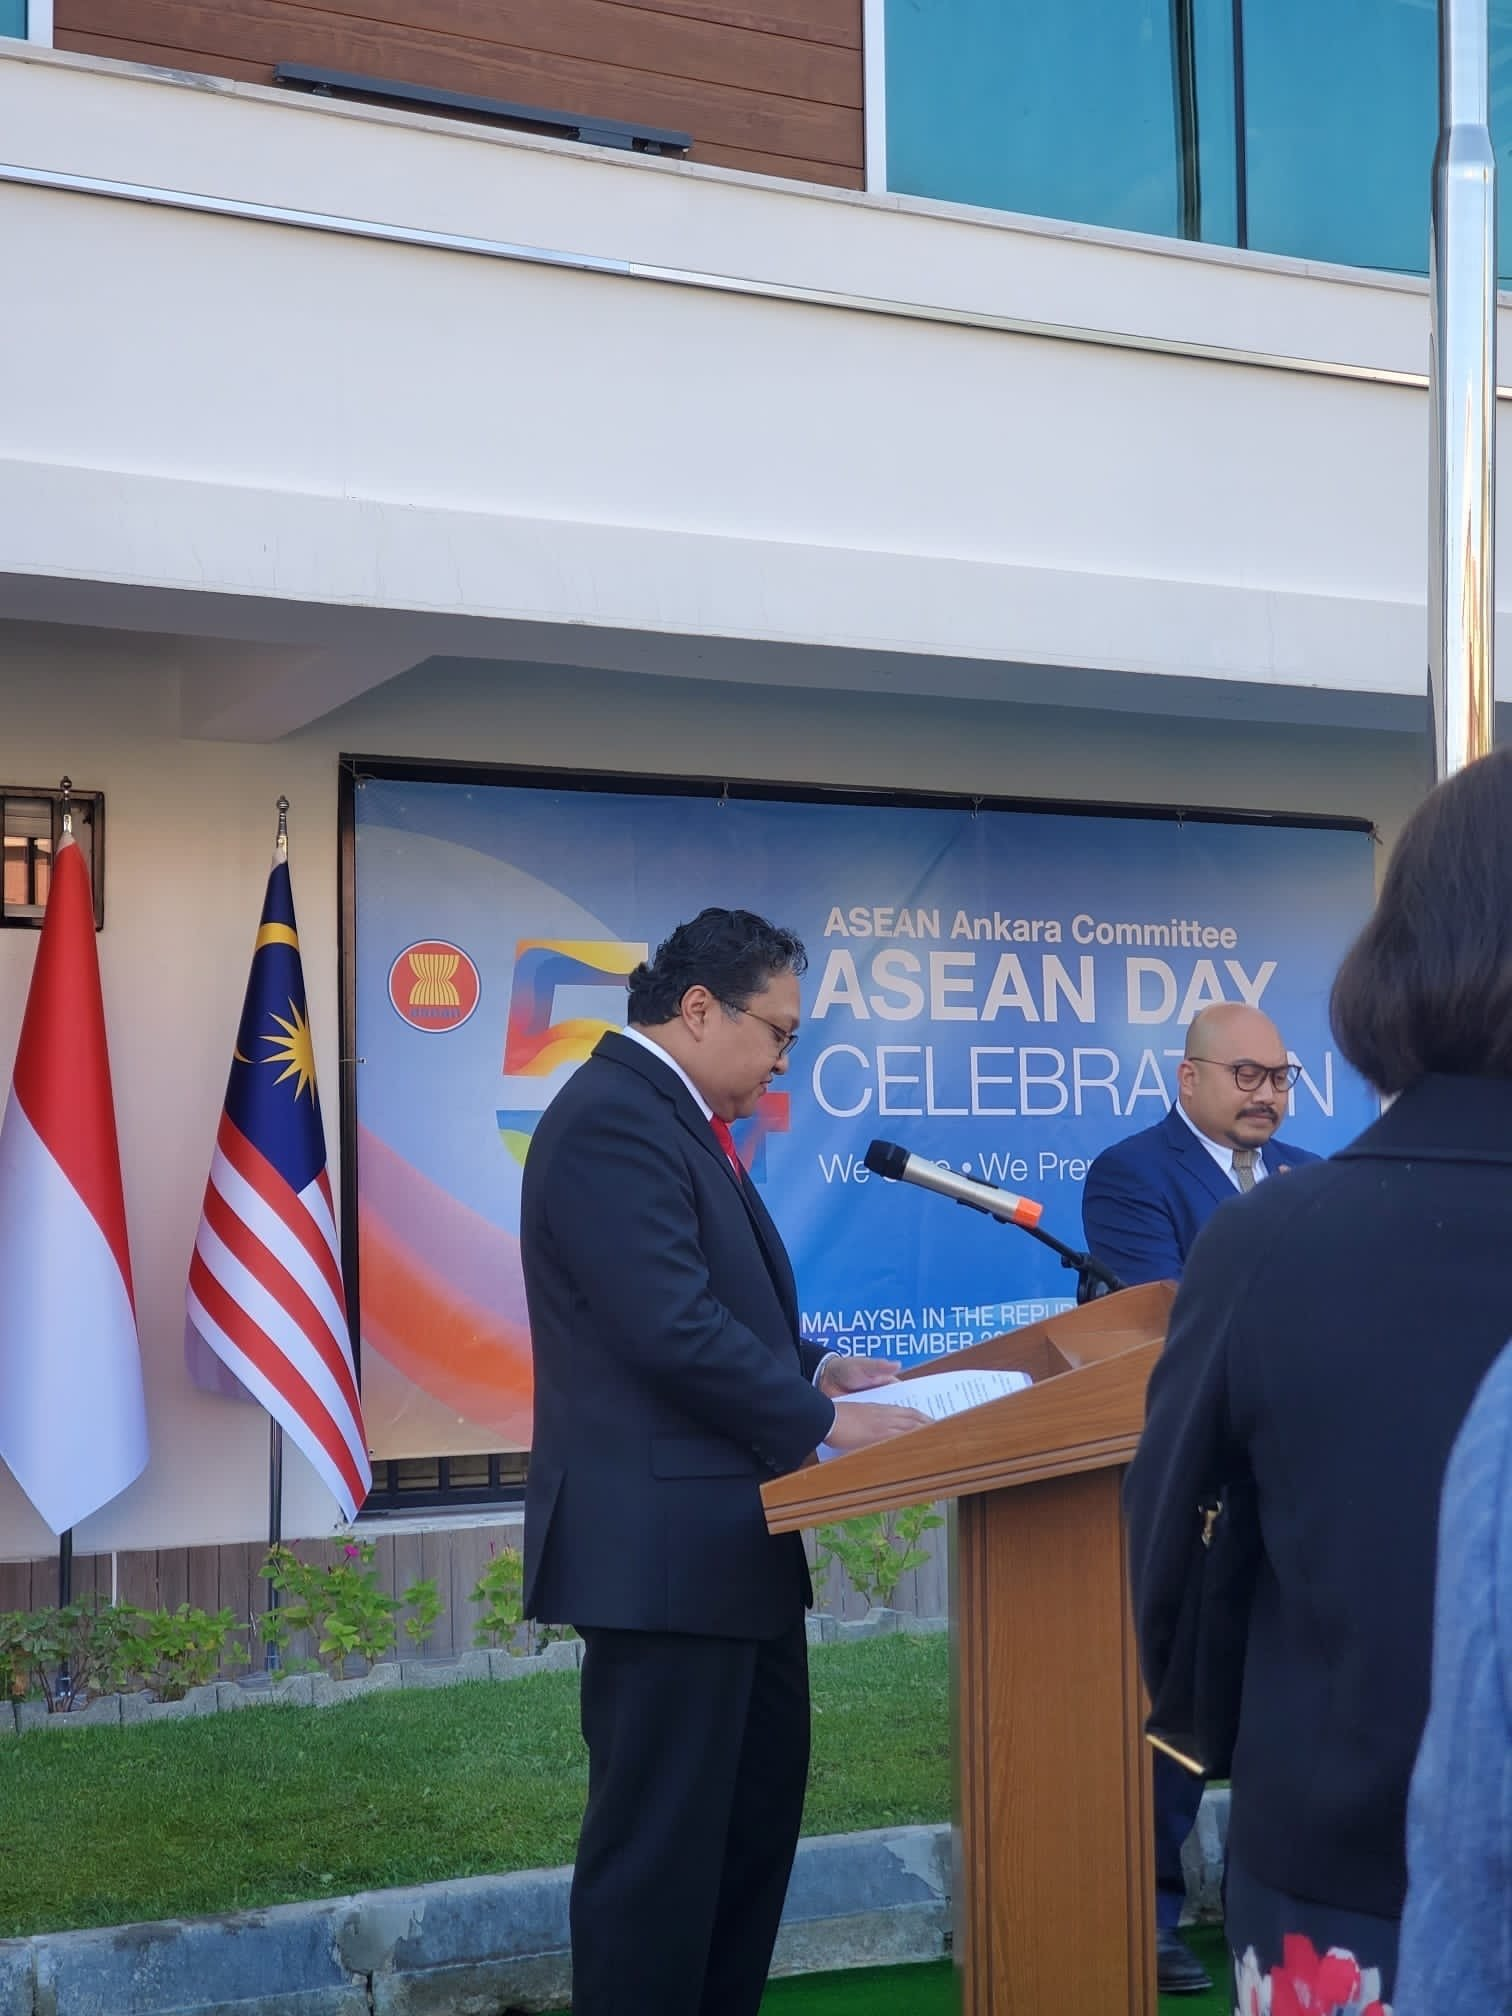 Malaysia's Ambassador to Turkey, Sazali Mustafa Kamal, speaking at an event on the occasion of ASEAN Day, at the Malaysian embassy in Ankara, Turkey, Sept. 17, 2021 (Courtesy of the Malaysian embassy in Turkey)